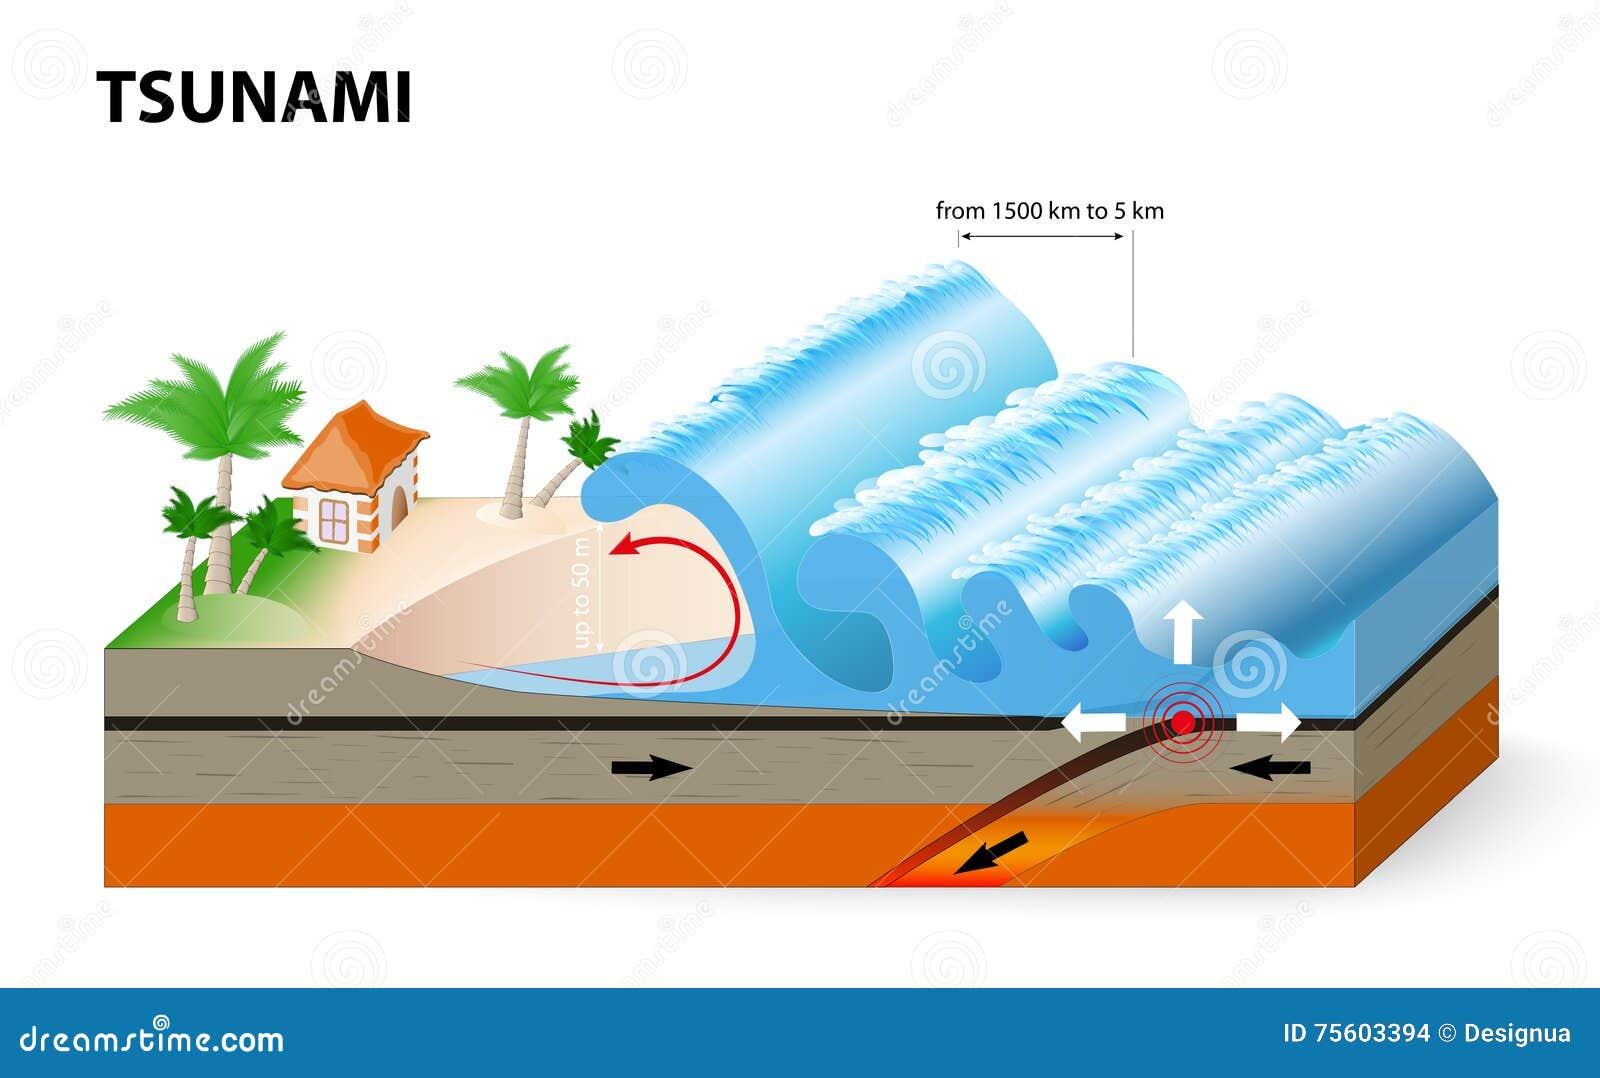 a tsunami is a series of huge waves stock vector illustration of killer  eruption 75603394 ocean waves clip art no background ocean wave clipart png